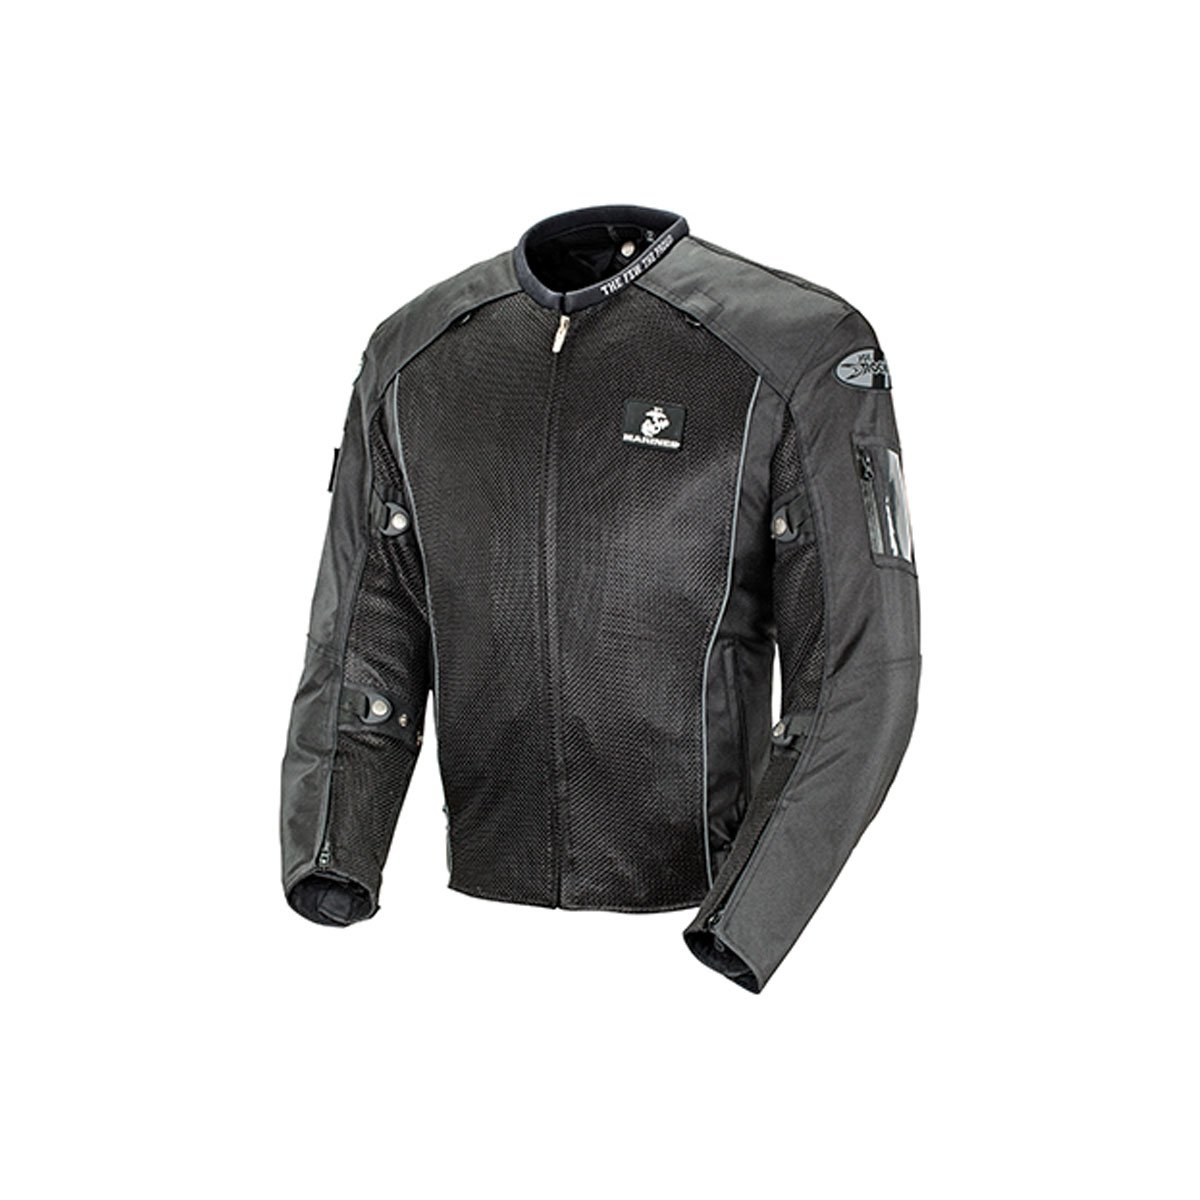 Joe Rocket Marines Recon Mens Mesh Sports Bike Racing Motorcycle Jacket - Black / Large